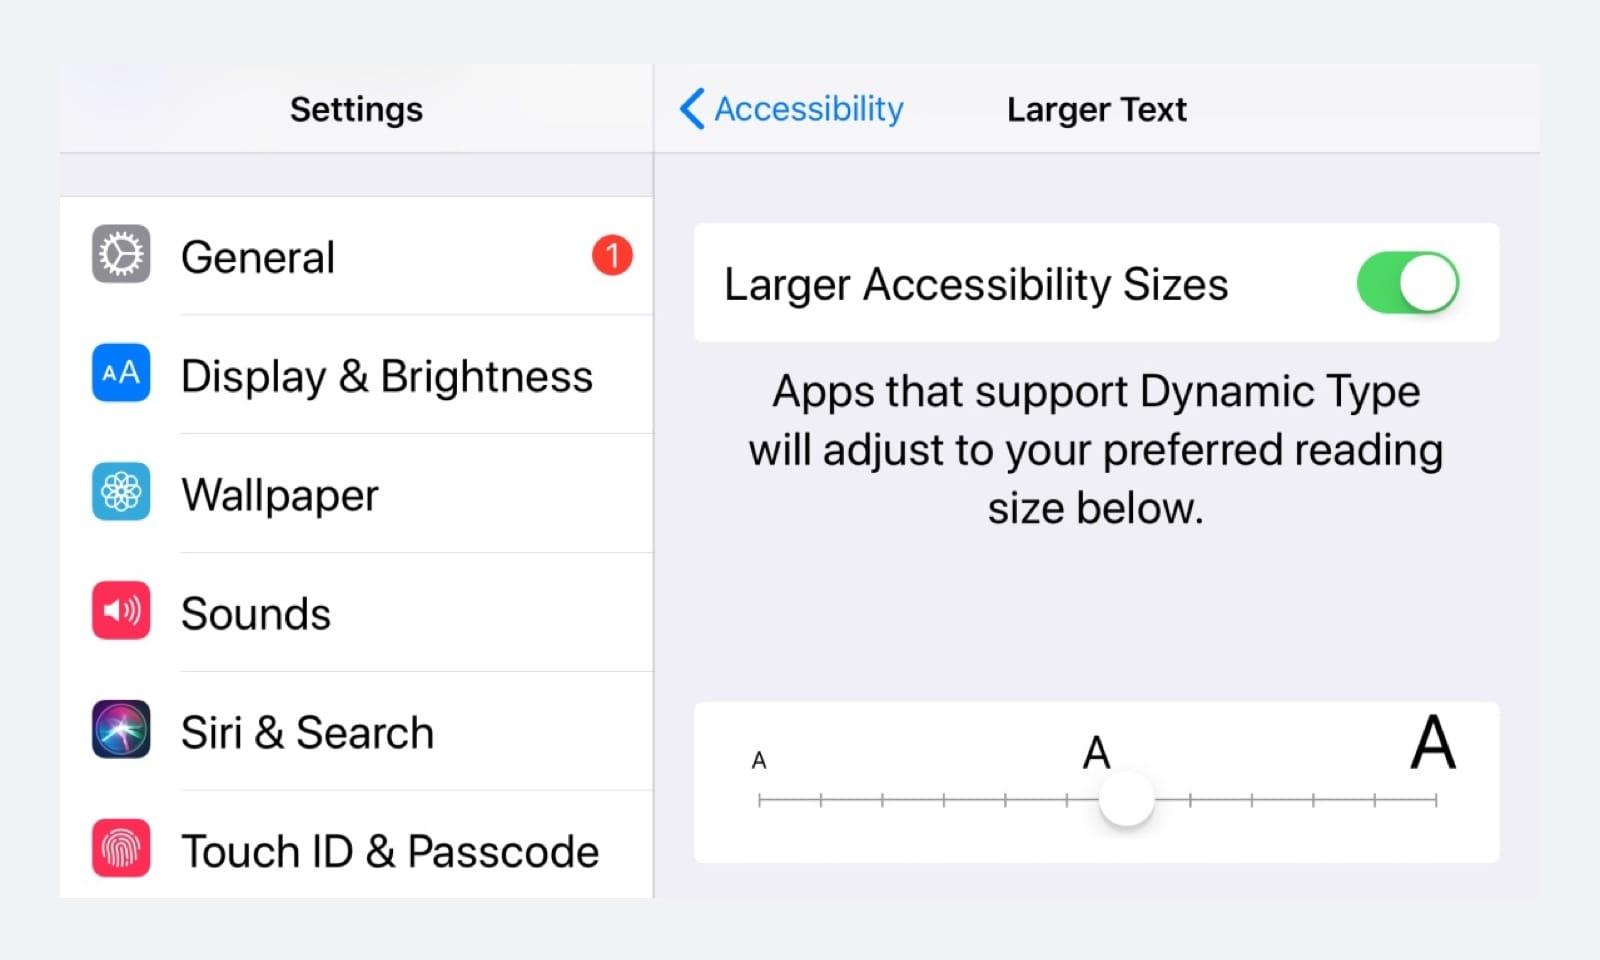 Дизайн под iPhone X. Гайдлайны для iOS 11 - 17